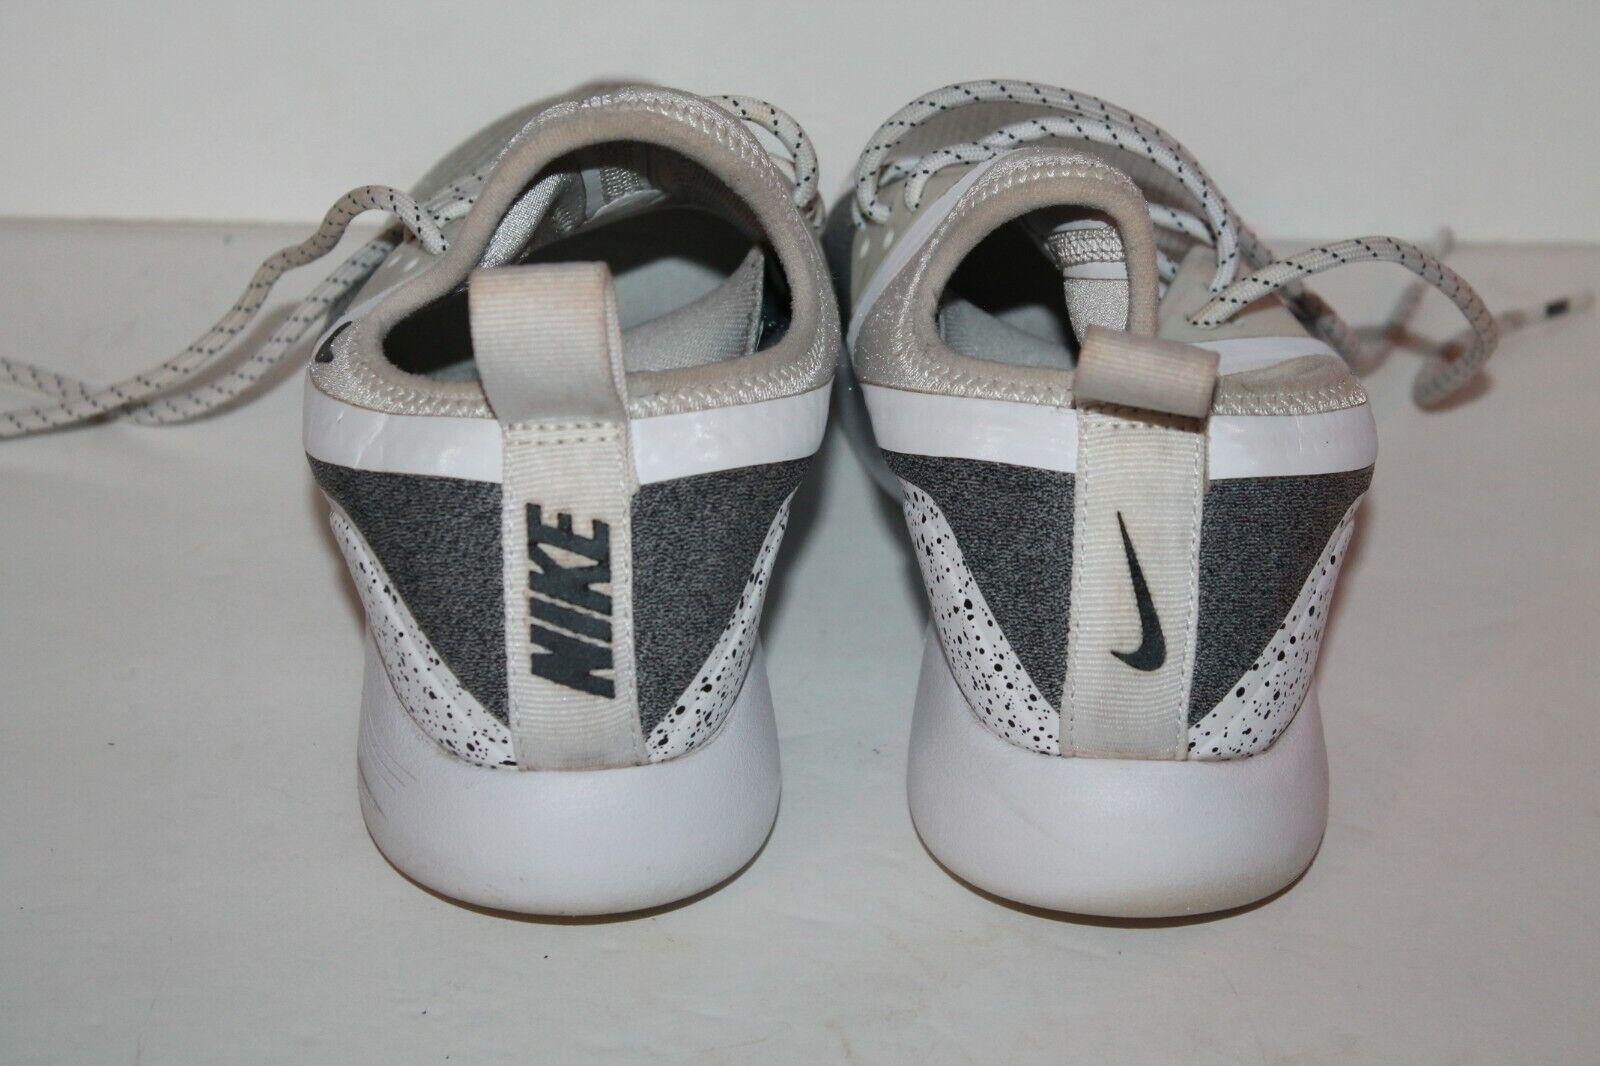 Nike lunarcharge Essentiel Chaussures De Course, #923620-100, Blanc/Gry, Femme US Taille 7